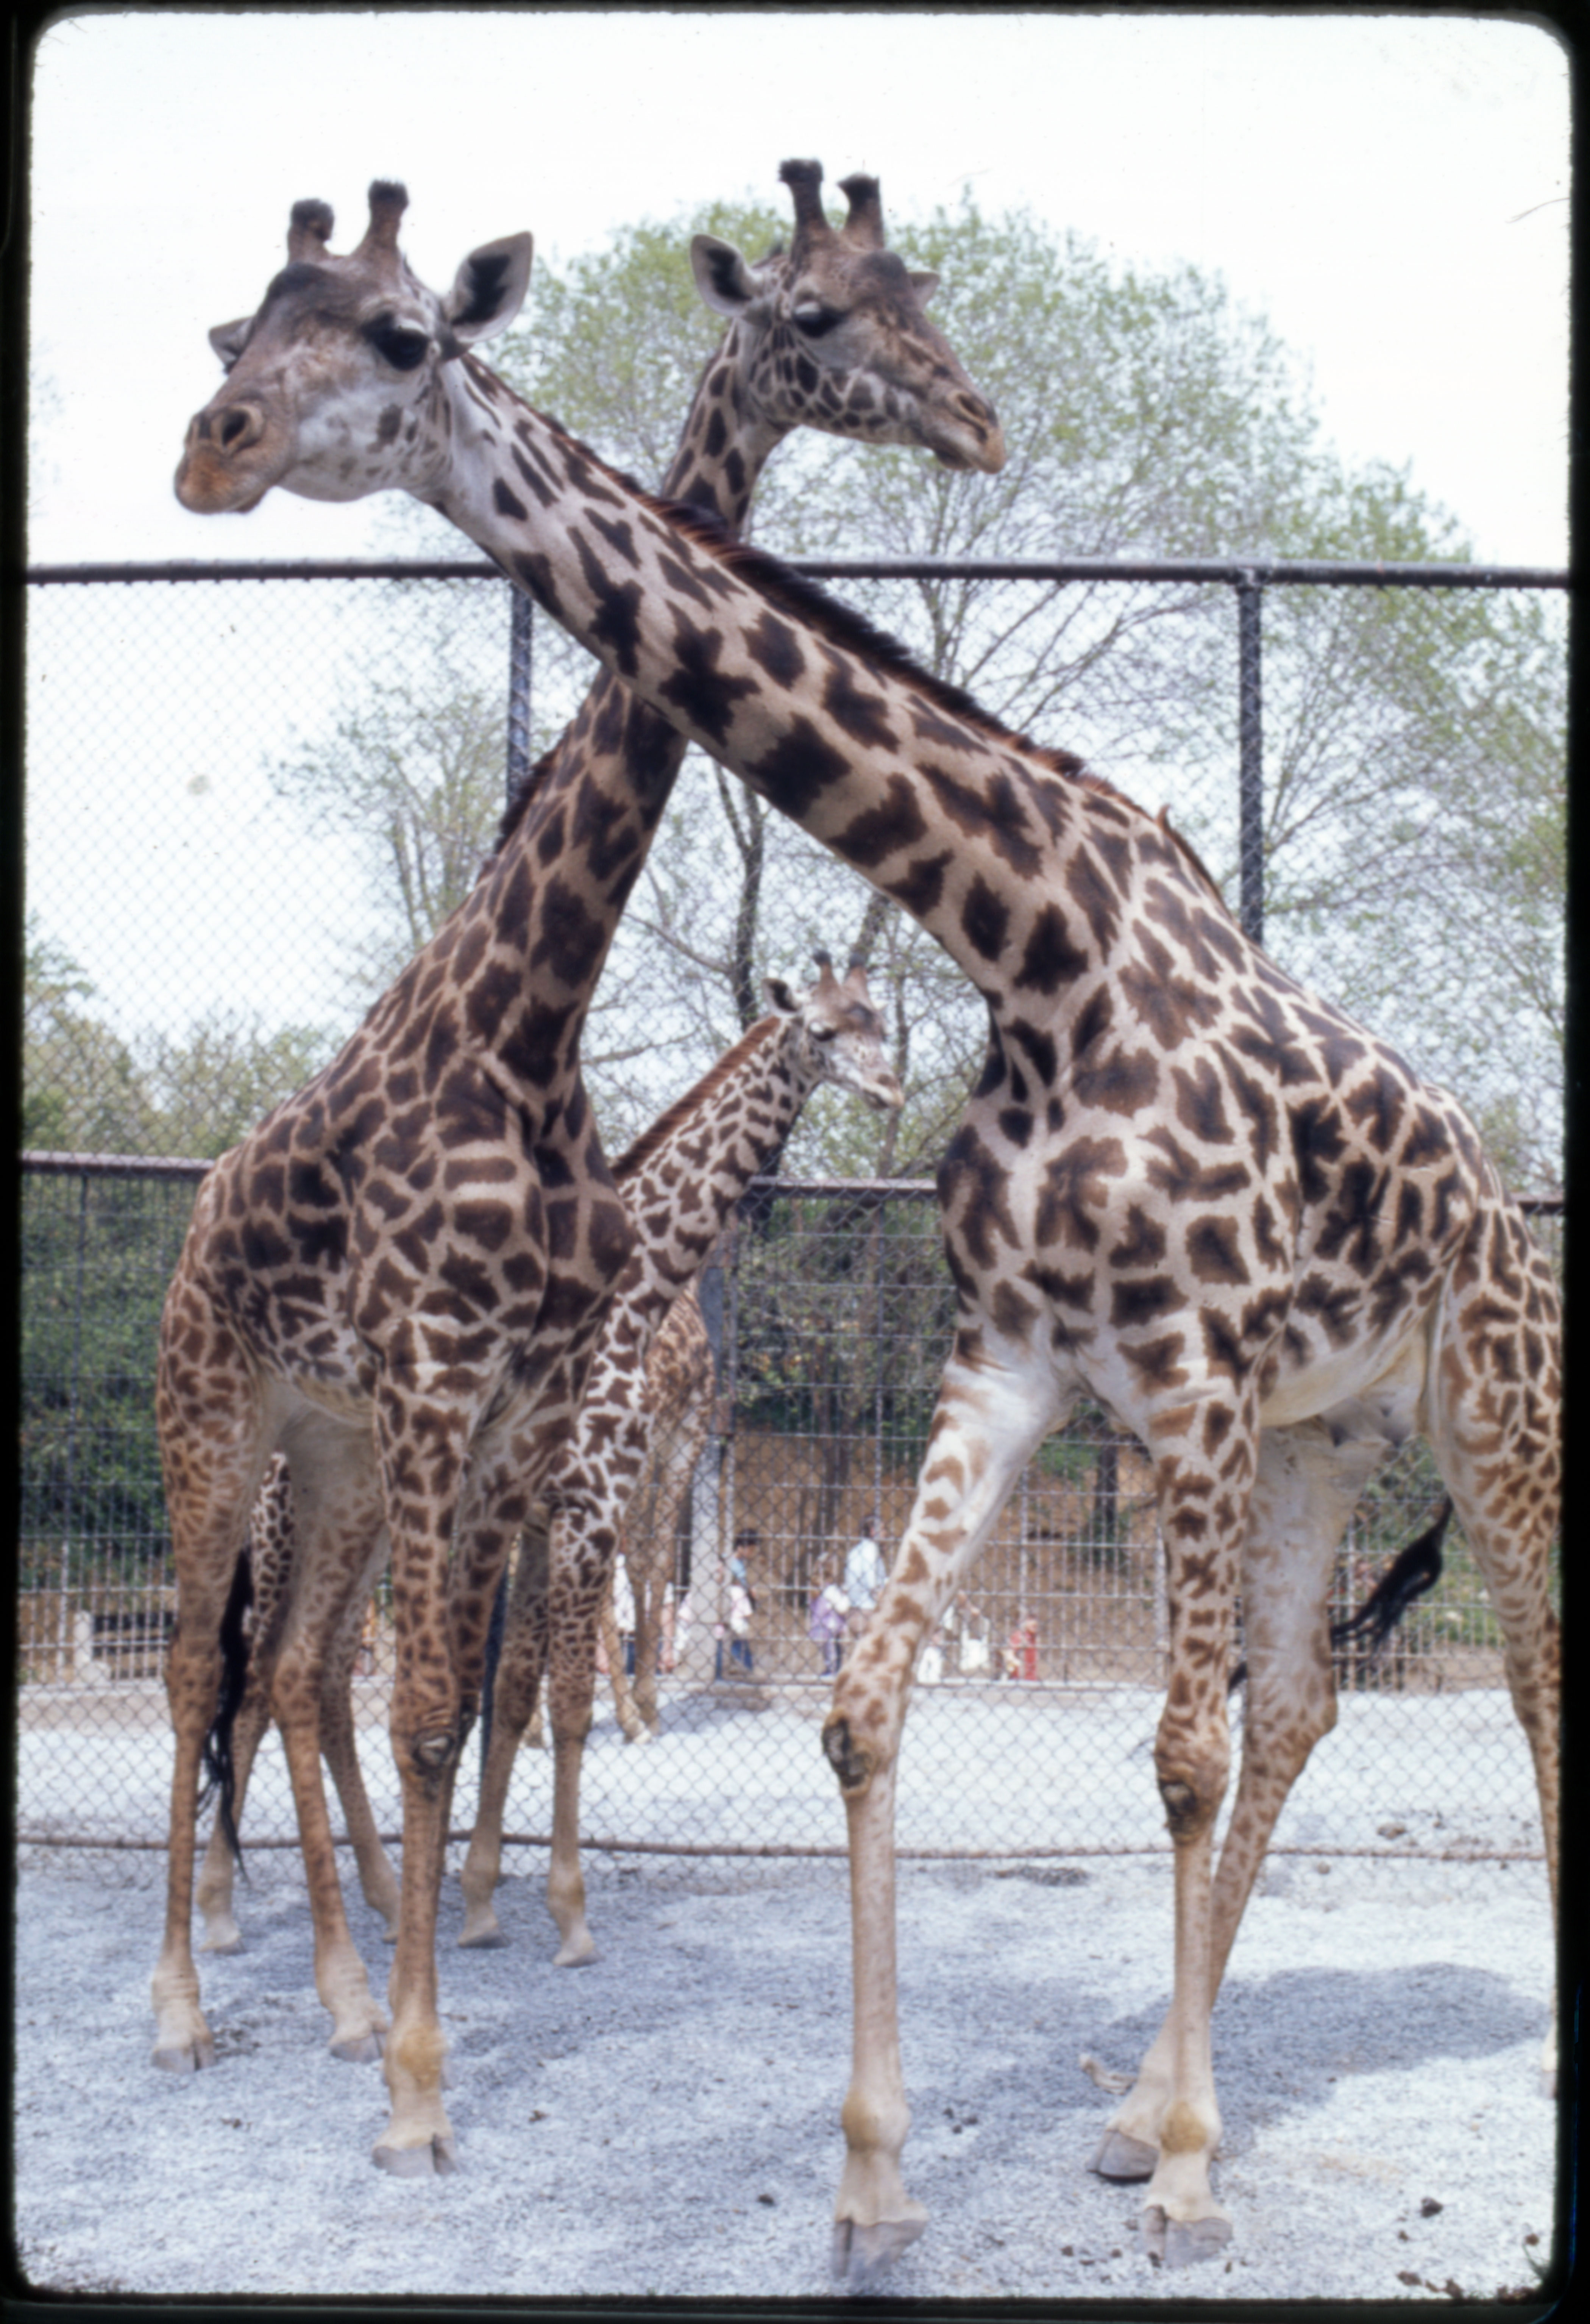 Masai Giraffes at National Zoological Park